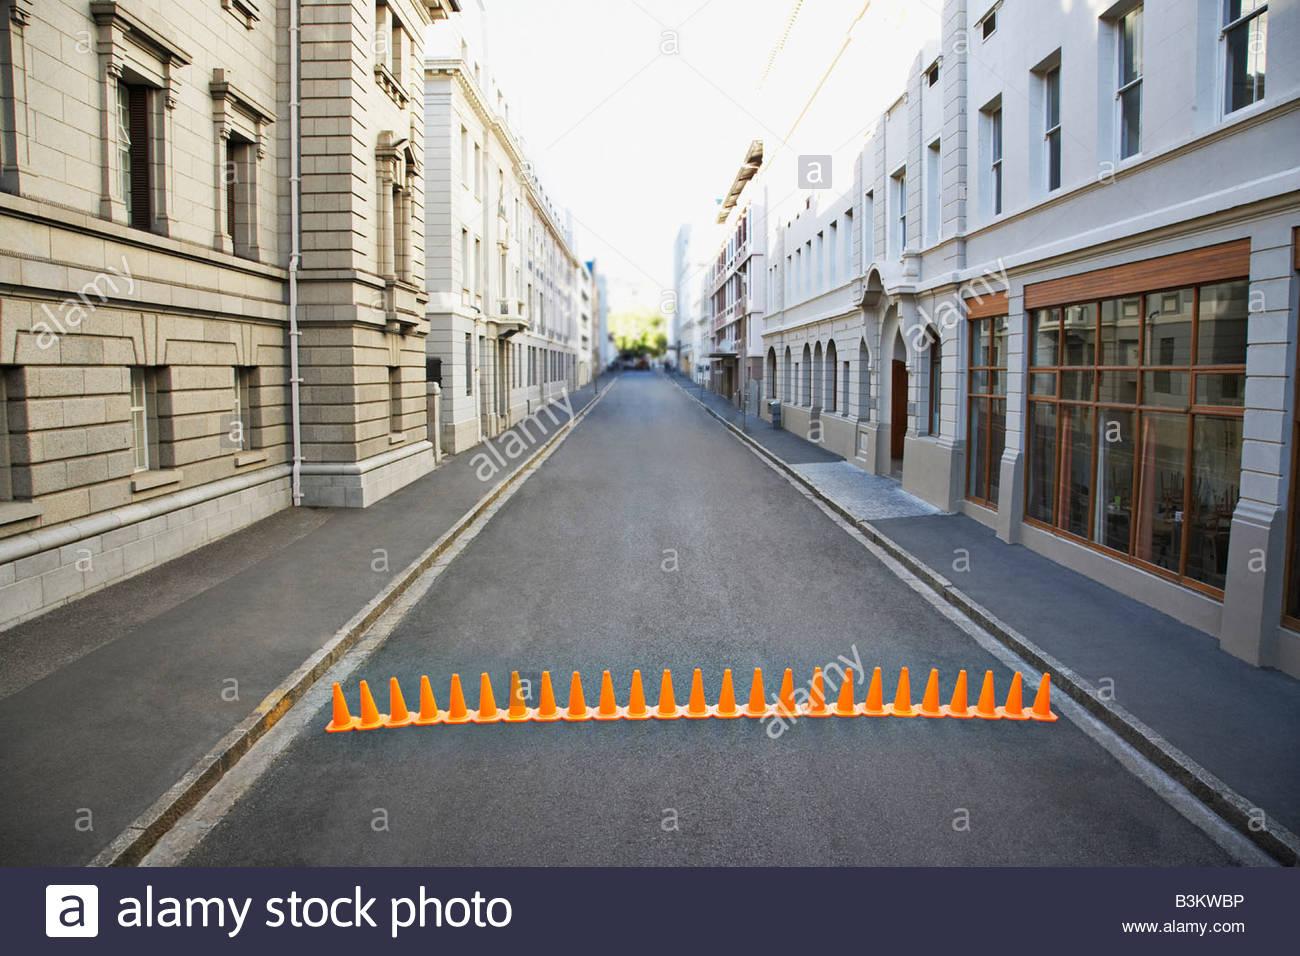 Line of traffic cones in urban roadway - Stock Image